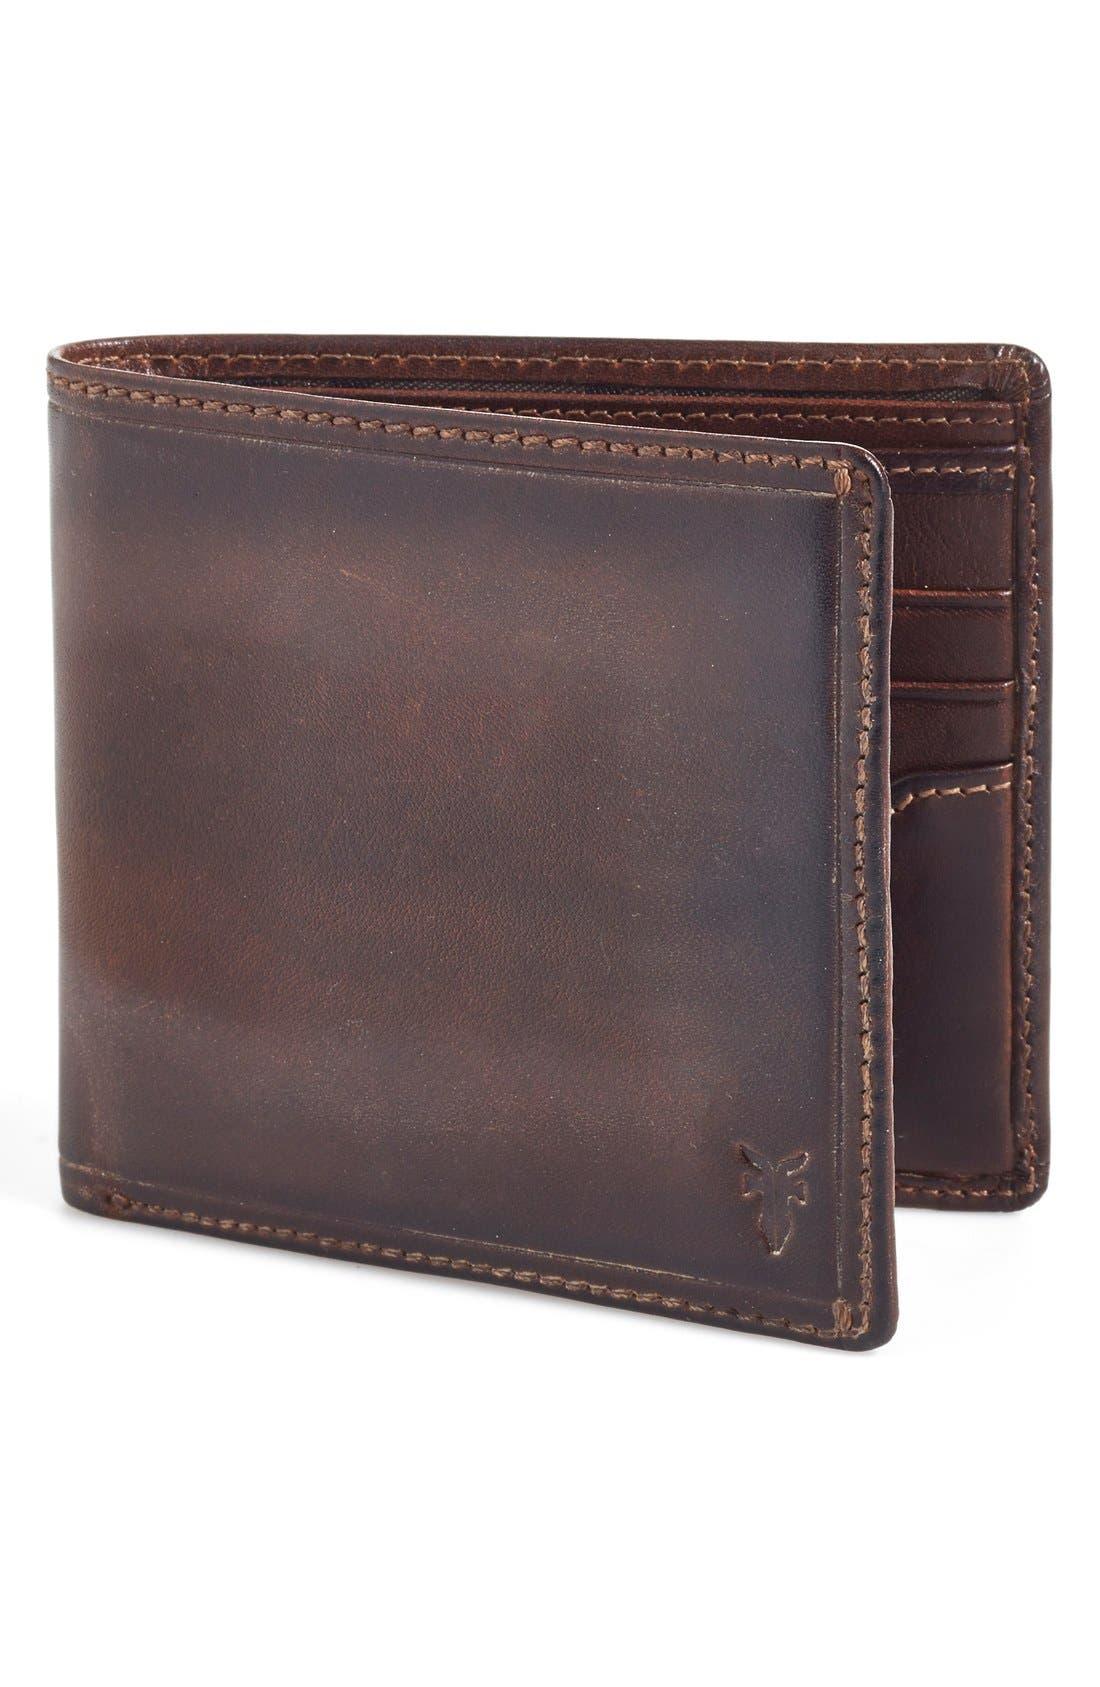 FRYE, 'Logan' Leather Billfold Wallet, Main thumbnail 1, color, SLATE